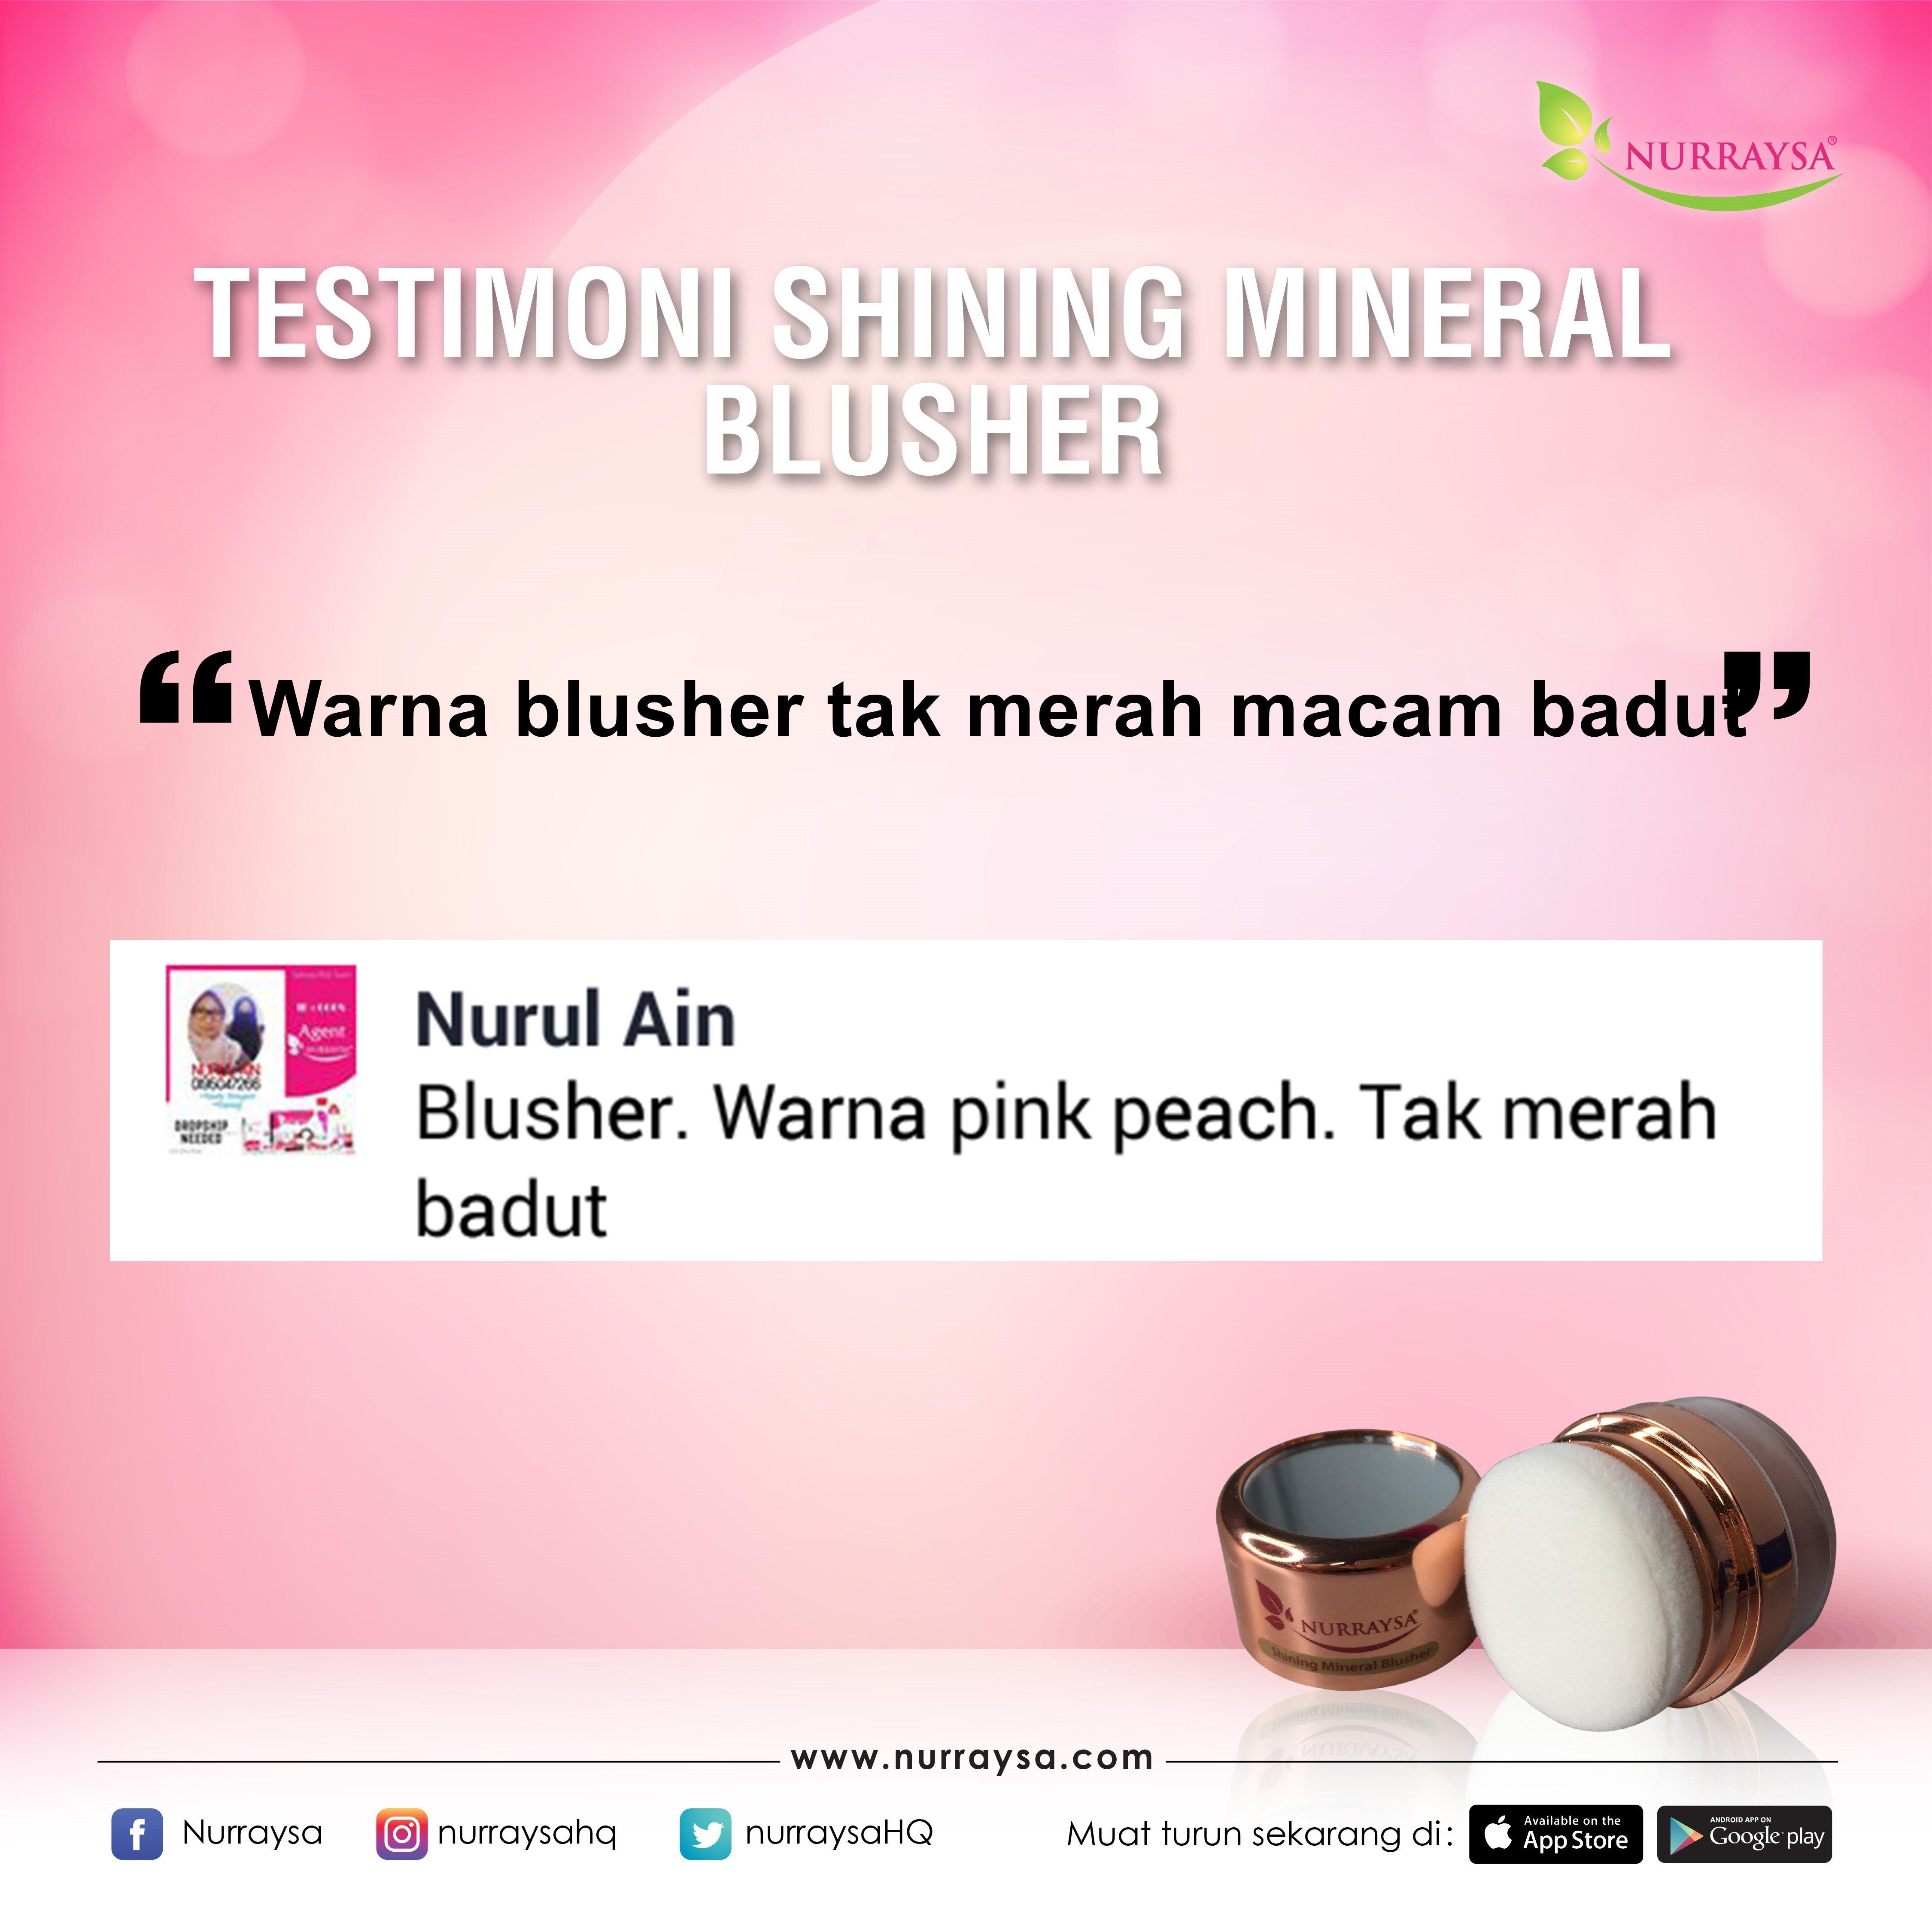 Testimoni Mineral Blusher 4